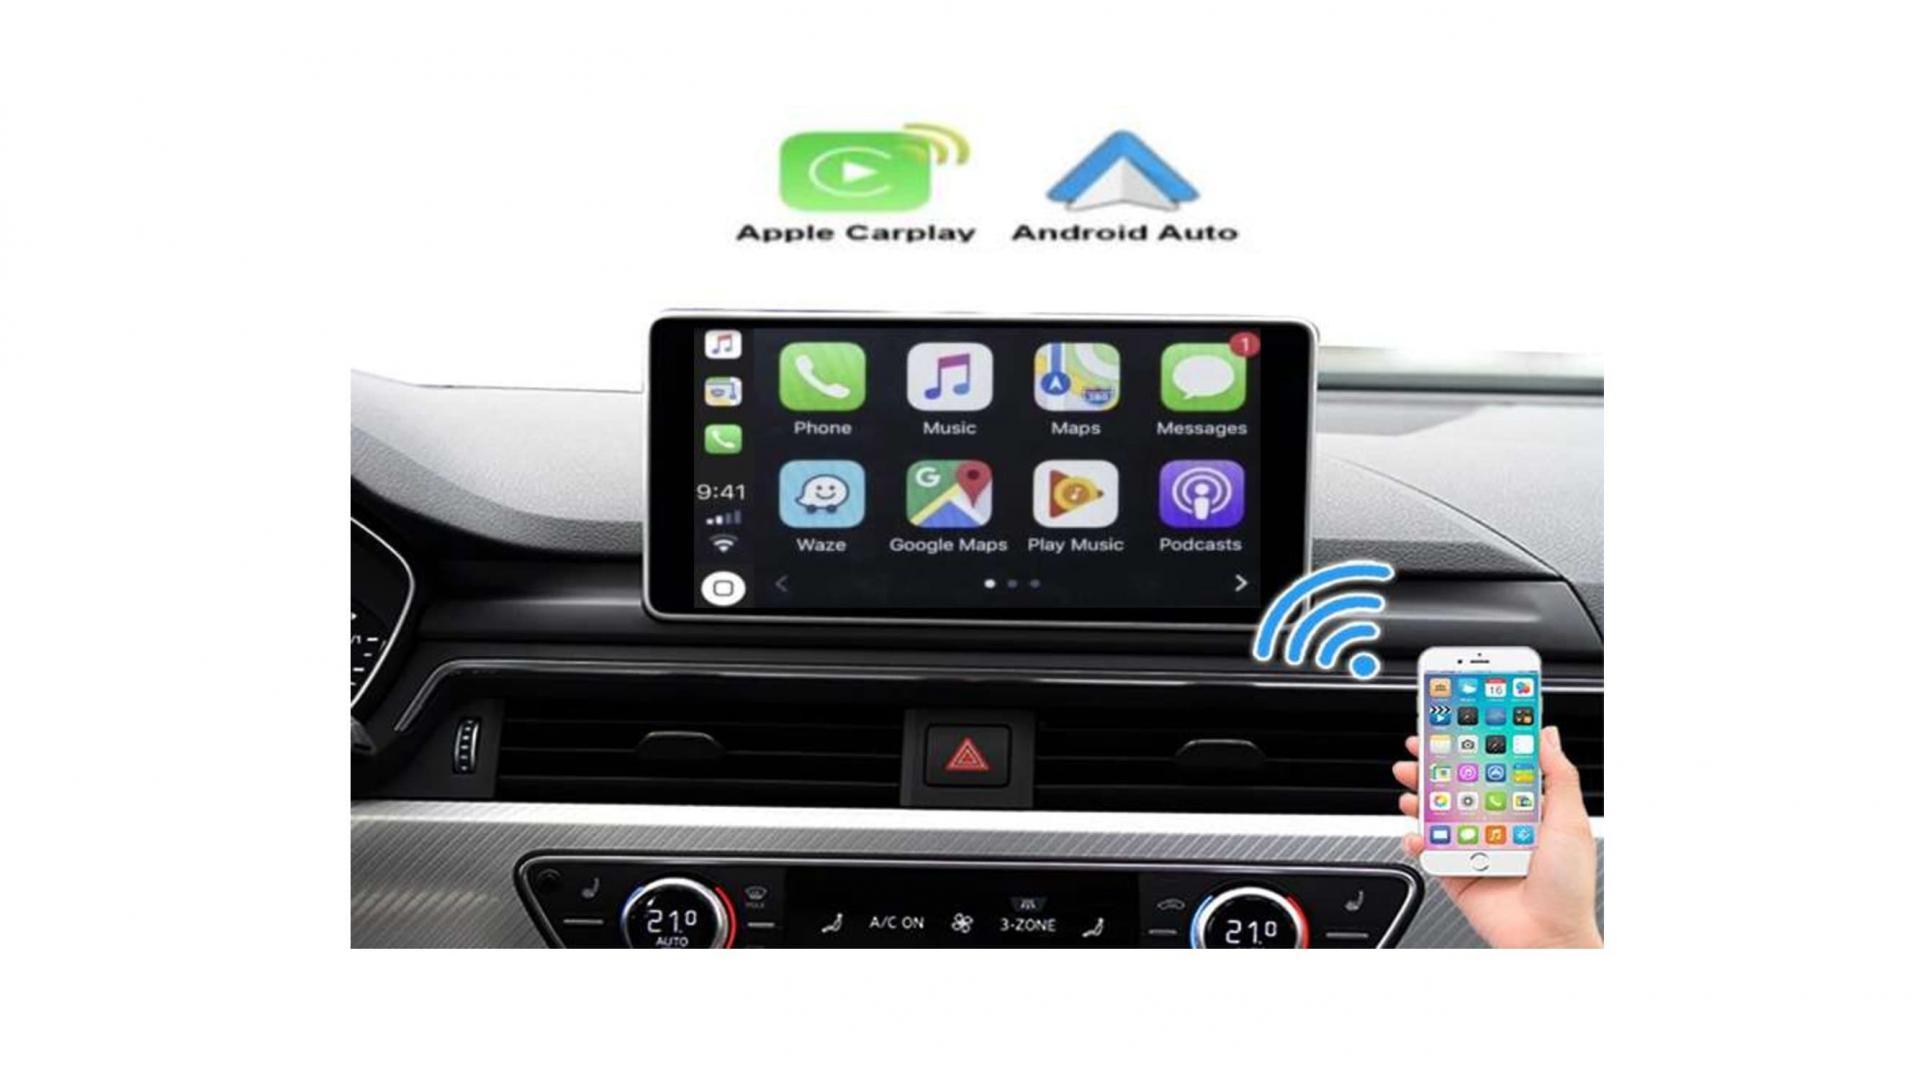 Mercedes classe g w463 5 v x cls gle glk slk ml gl slc b cla gla glb ntg4 0 ntg 5 0 ntg4 5 c w204 sl r231 carplay android auto gps autoradio 2010 2011 2012 2013 2014 2015 2016 2017